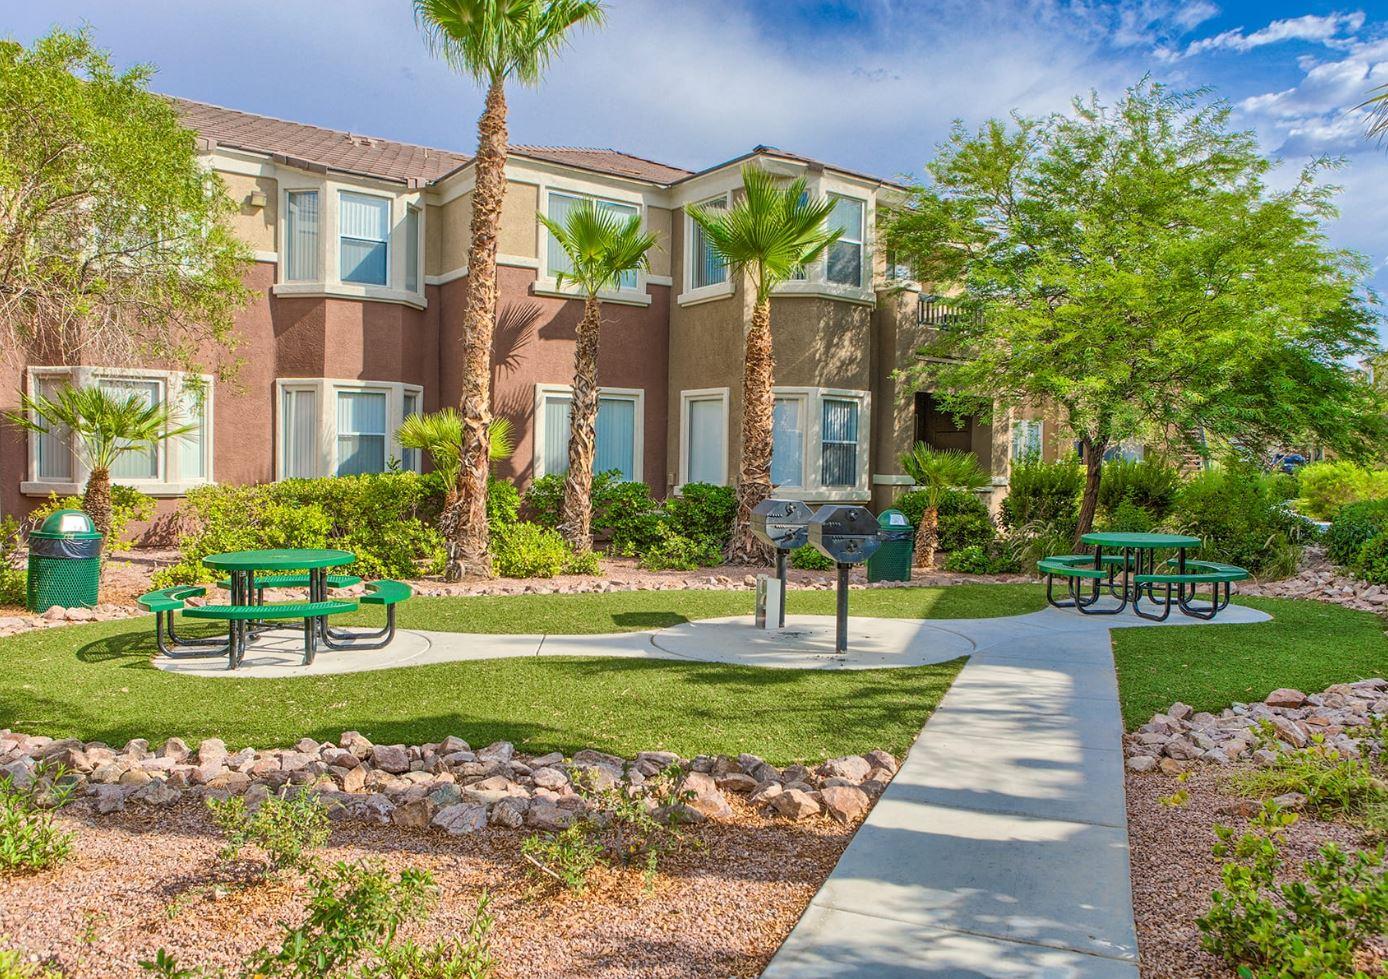 Positano Apartments $46,500,000   223(f) |  Green  Las Vegas, NV 360 units July 2019